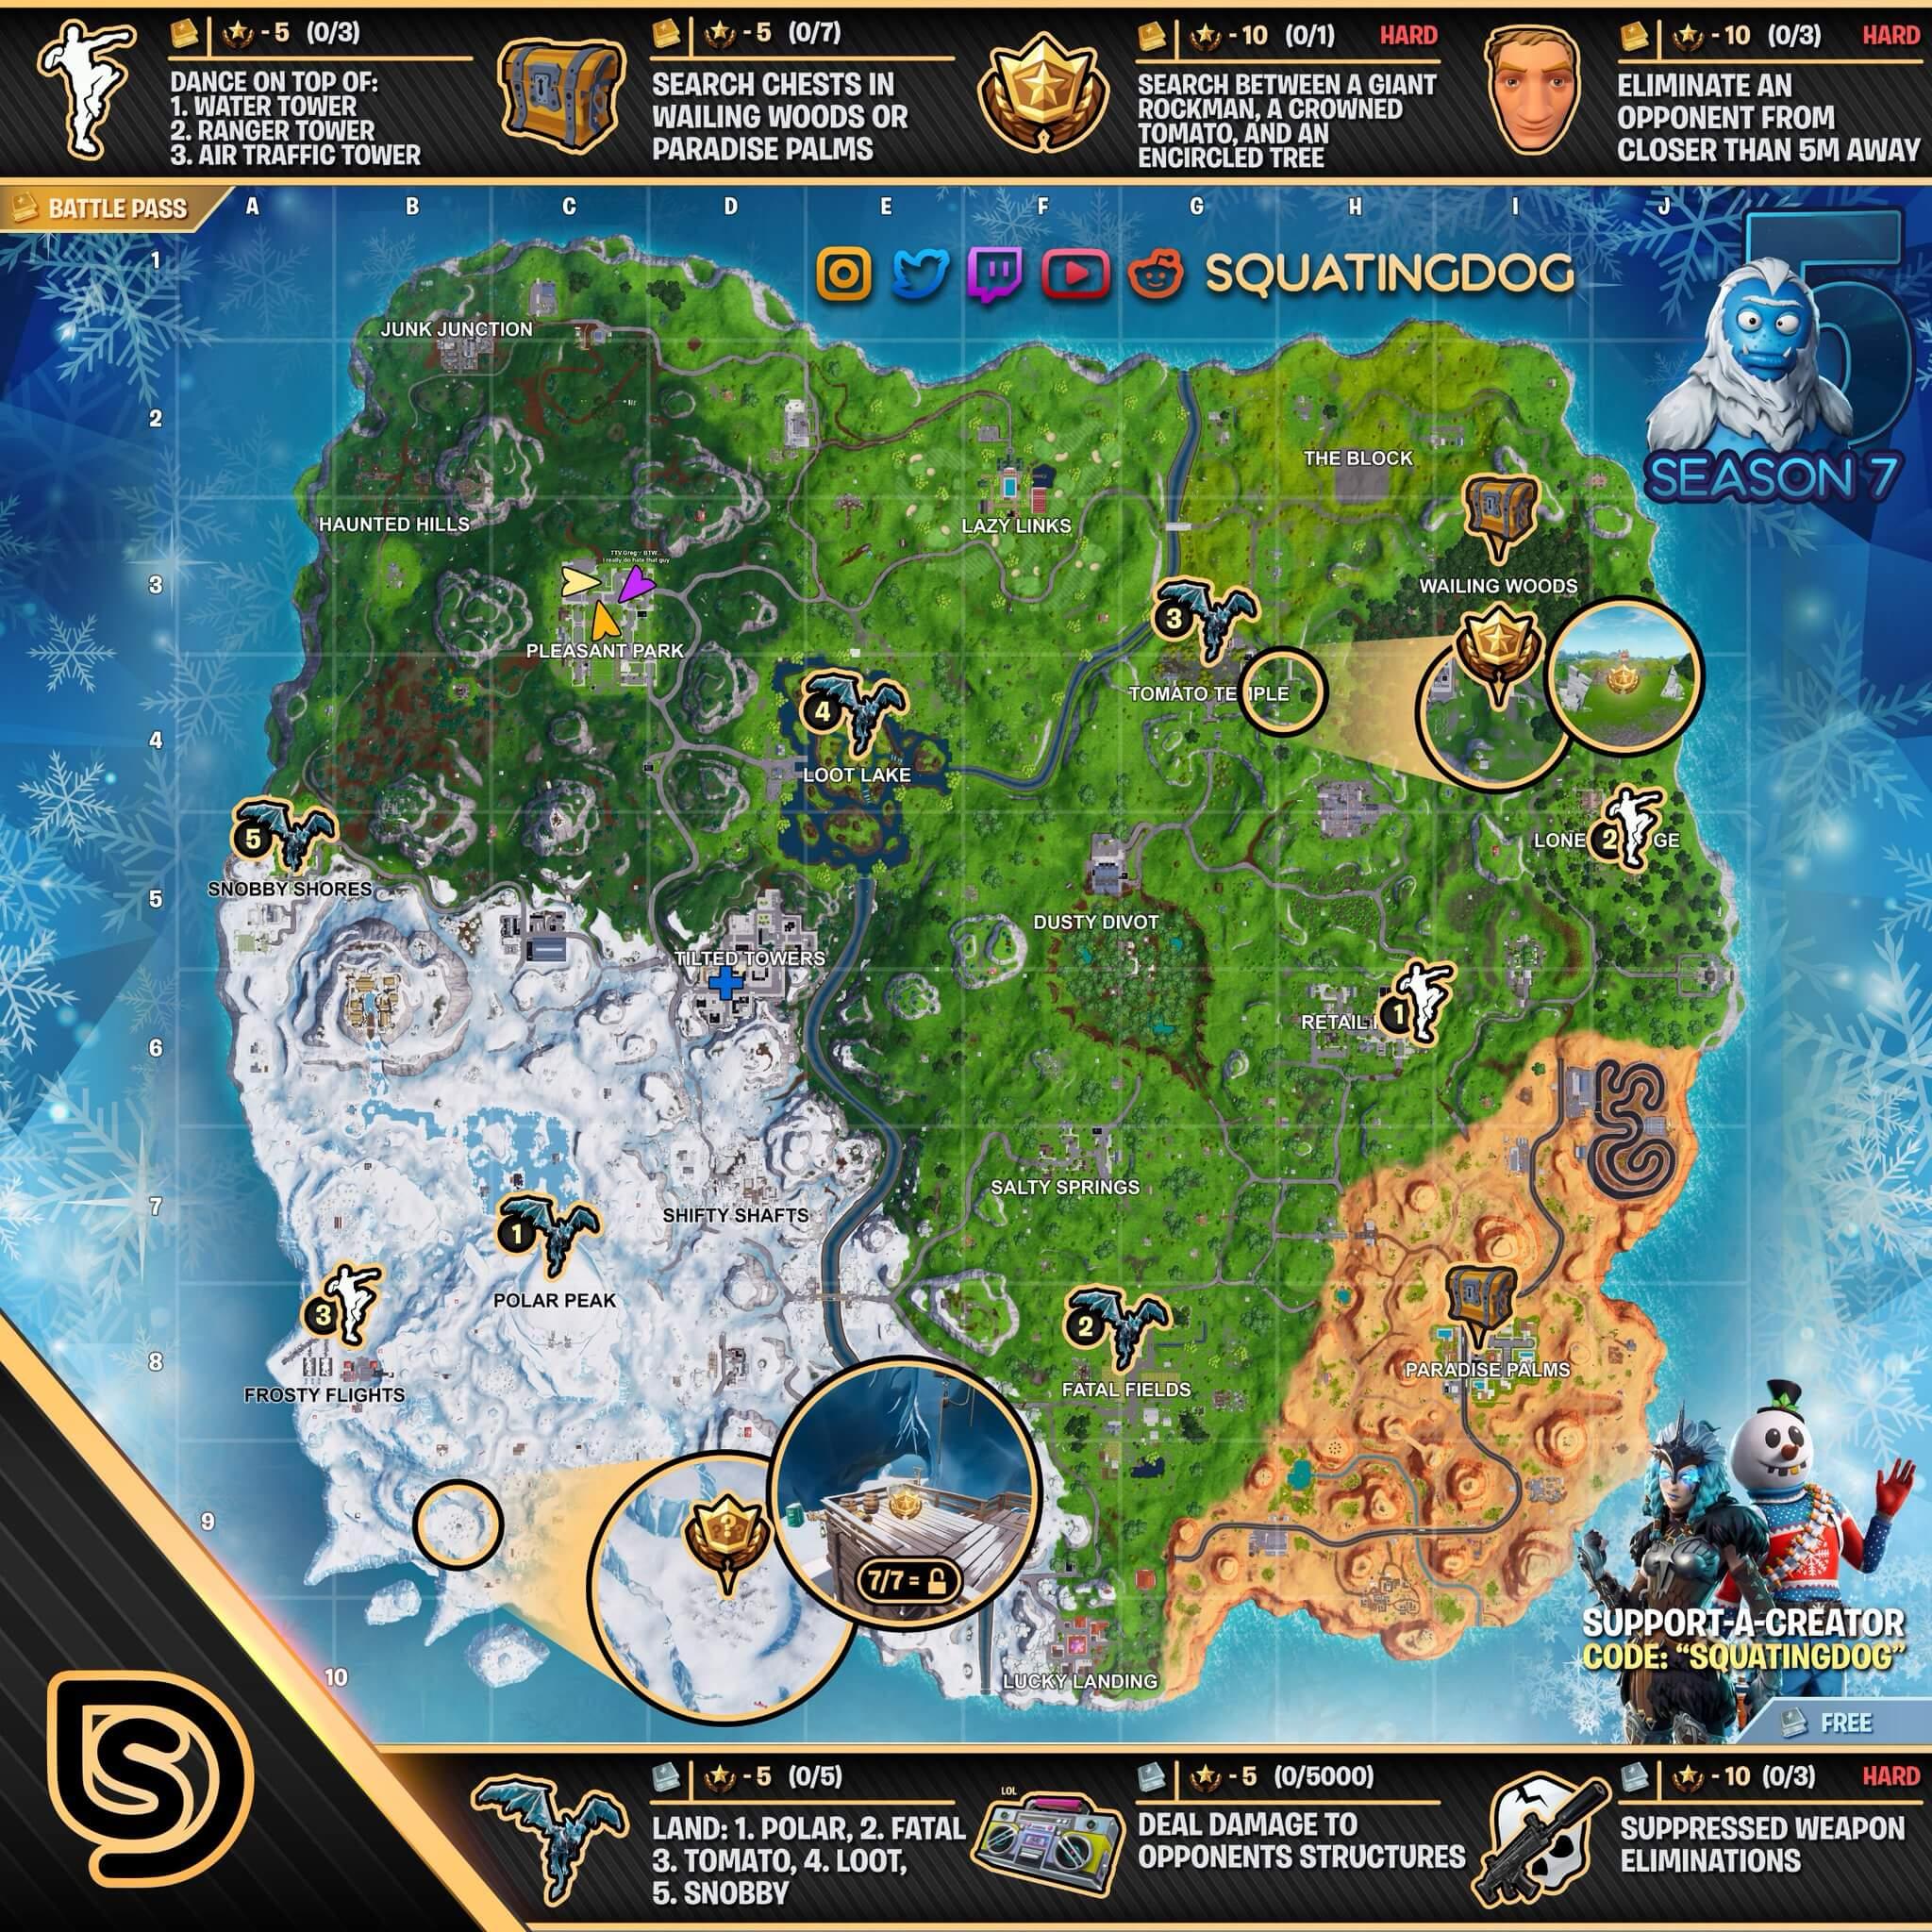 Fortnite Mapa semana 5 temporada 7